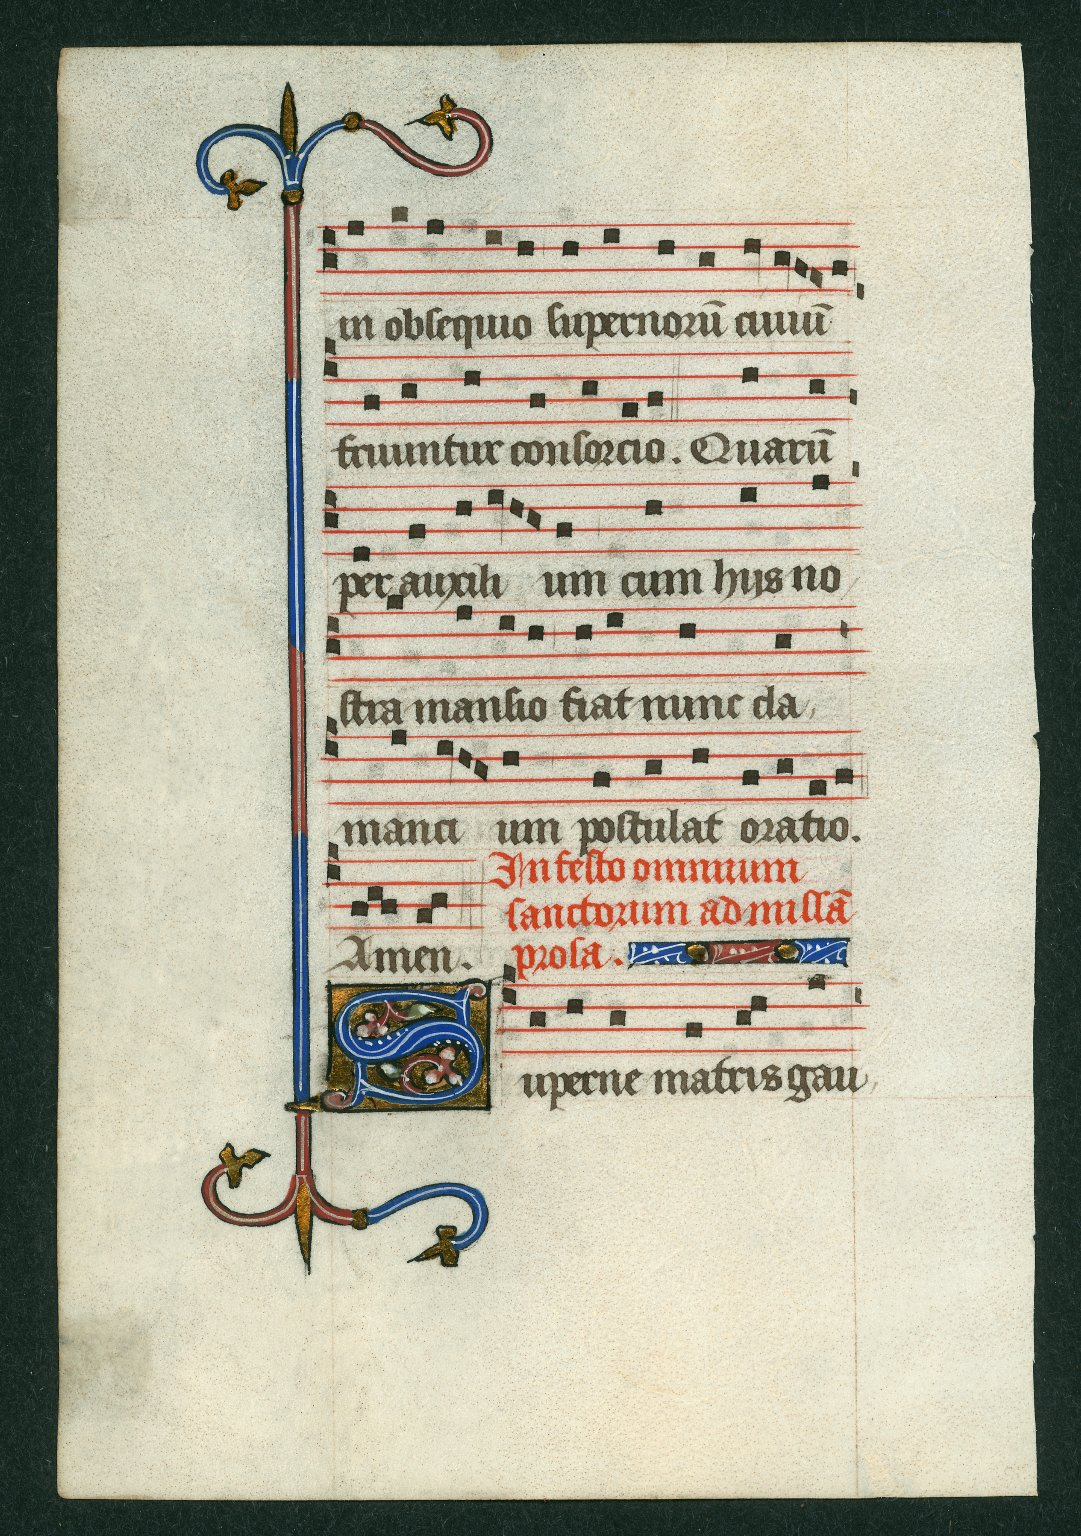 Hymnal, illuminated. France